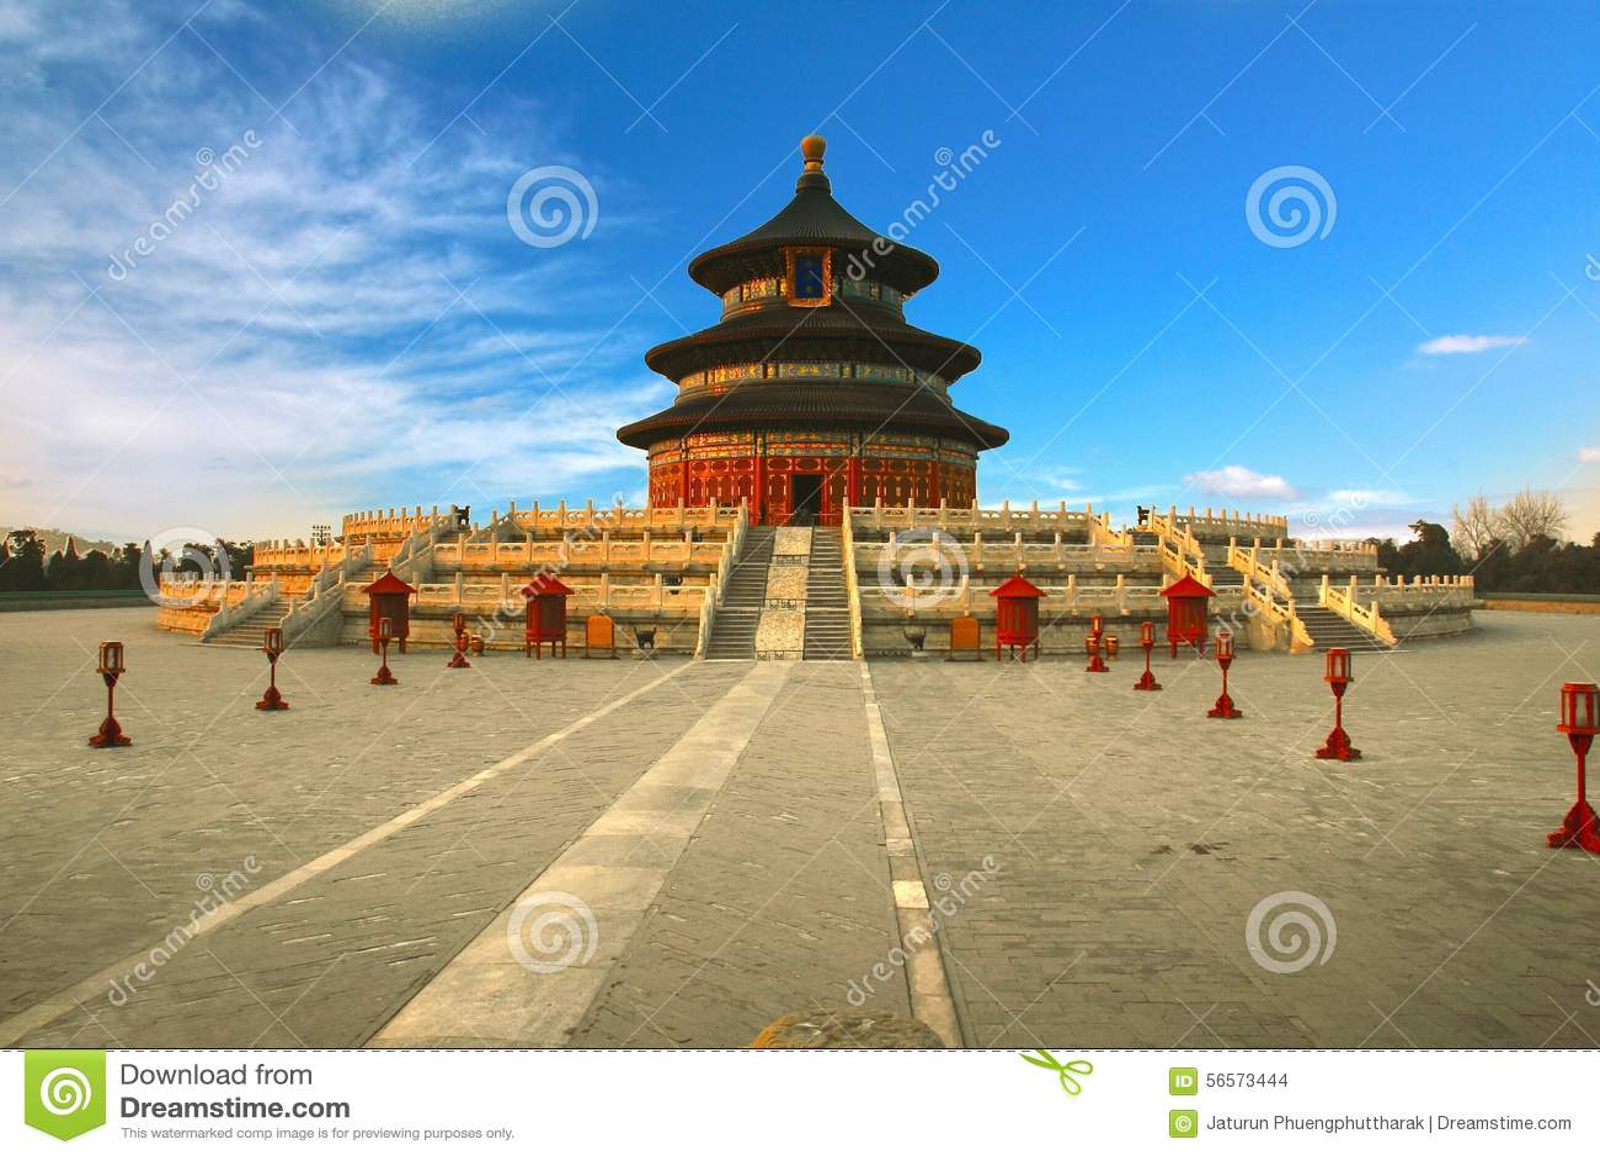 Download Ναός του ουρανού στο Πεκίνο, Κίνα Στοκ Εικόνες - εικόνα από ιστορικός, ιστορία: 56573444